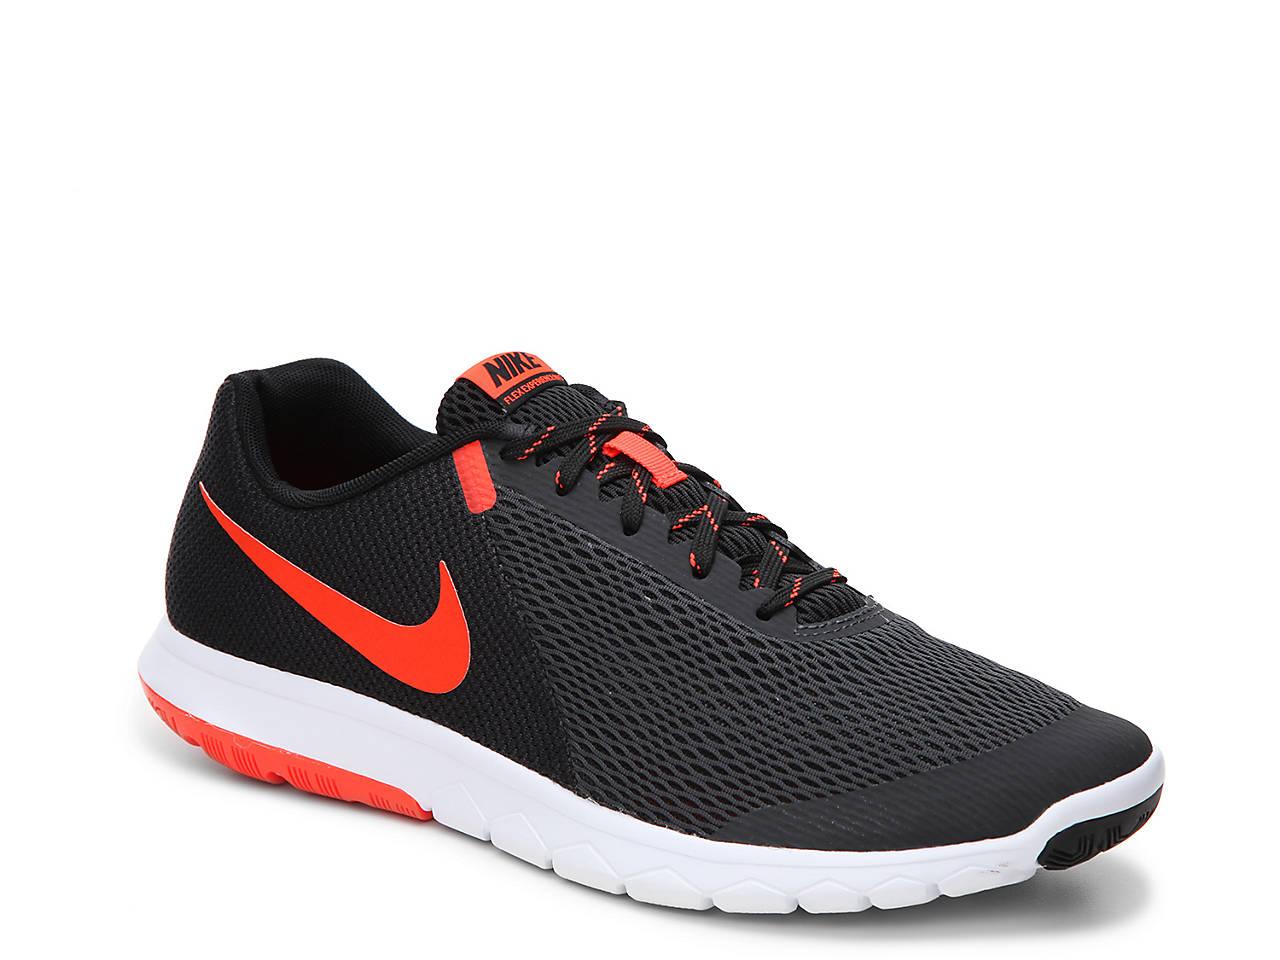 06ae1f6504bb Nike Flex Experience Run 5 Lightweight Running Shoe - Men s Men s ...